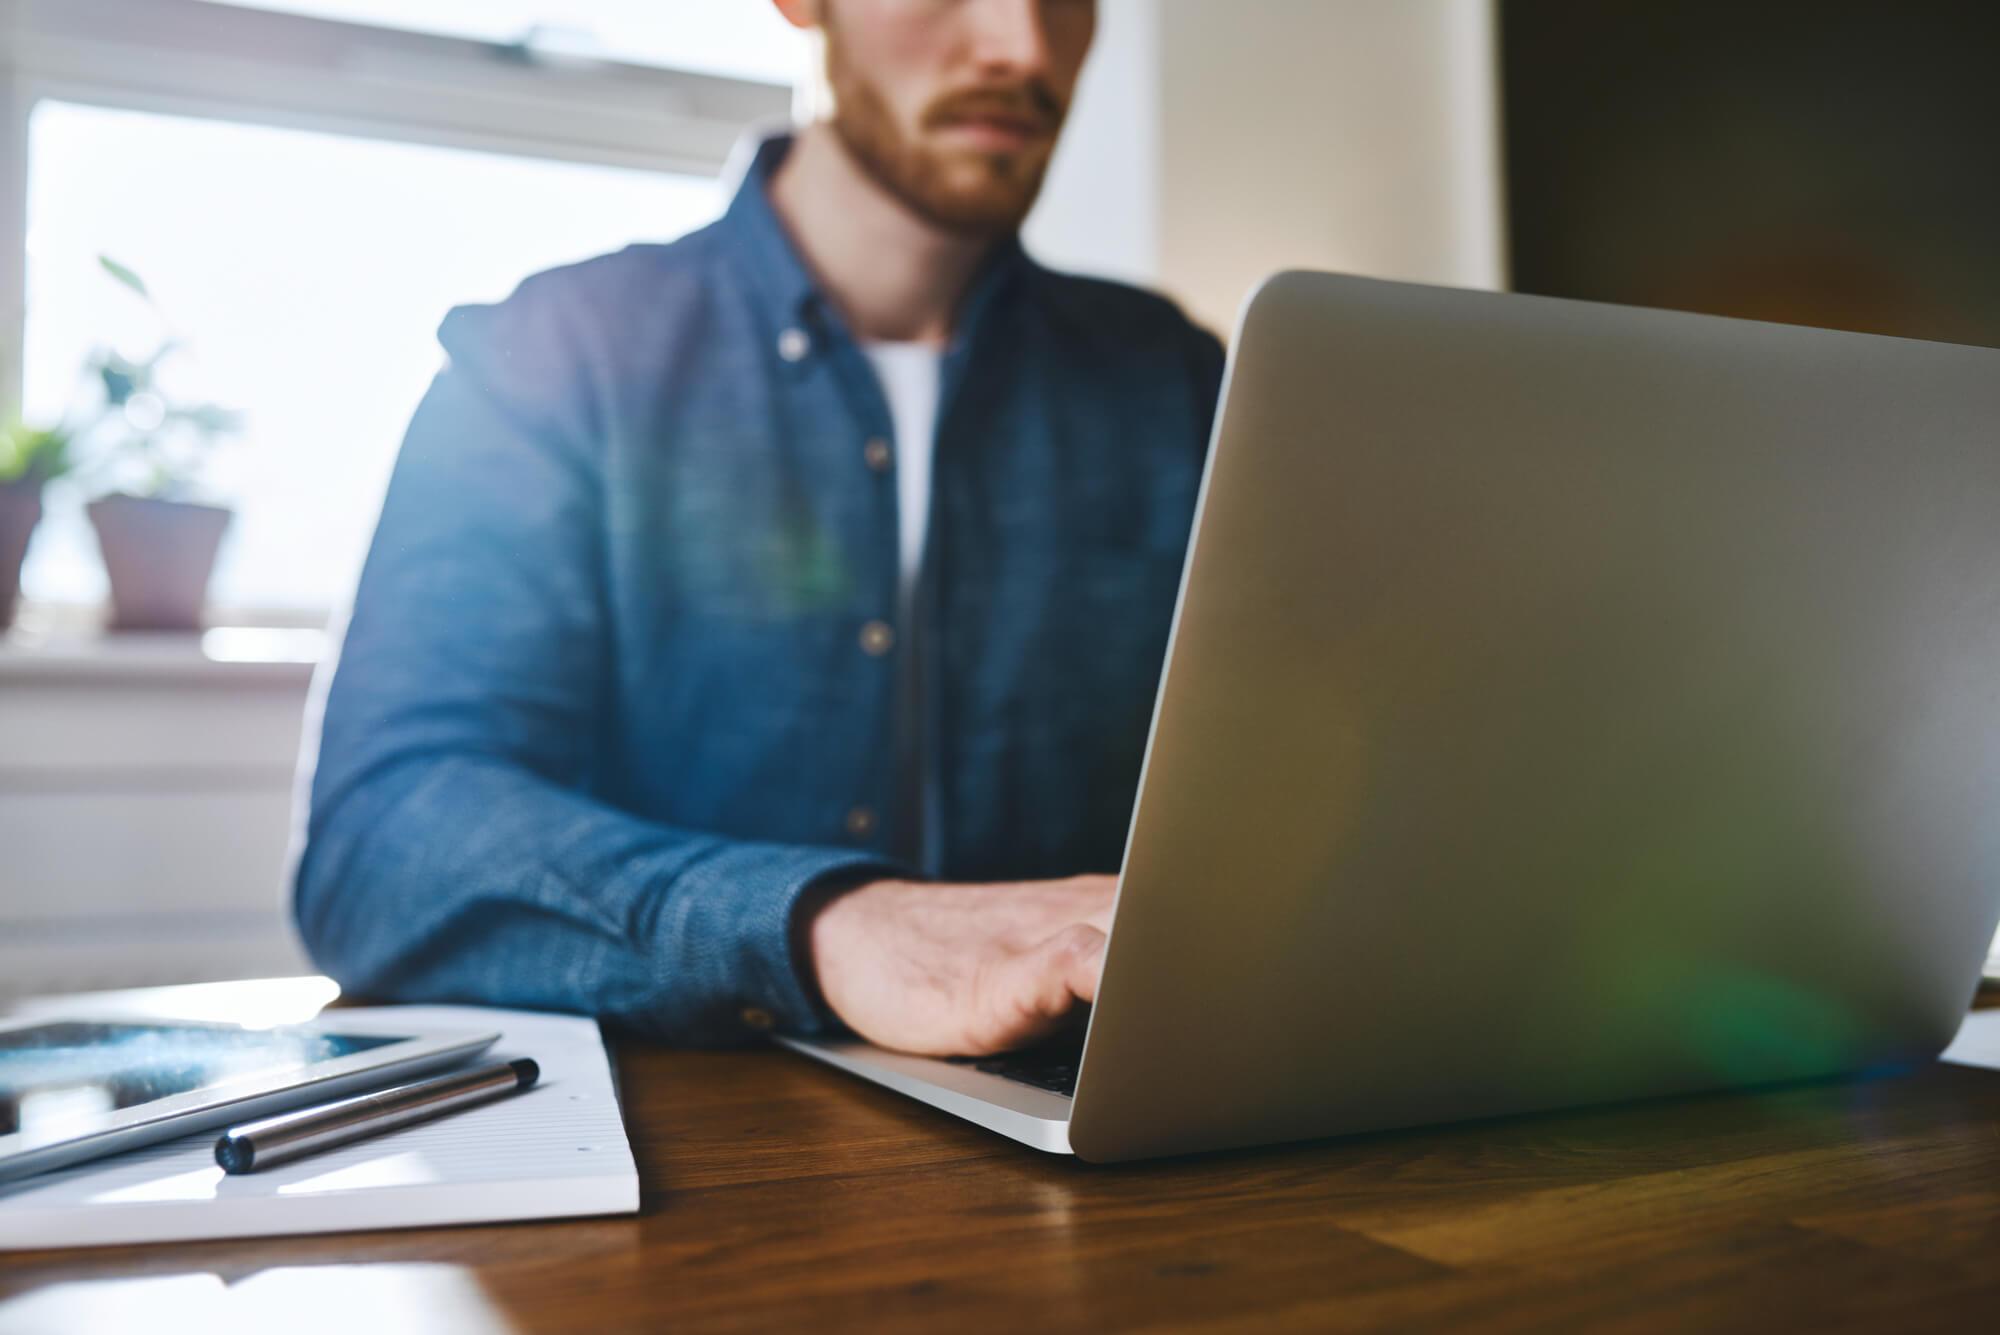 escritório virtual como funciona?